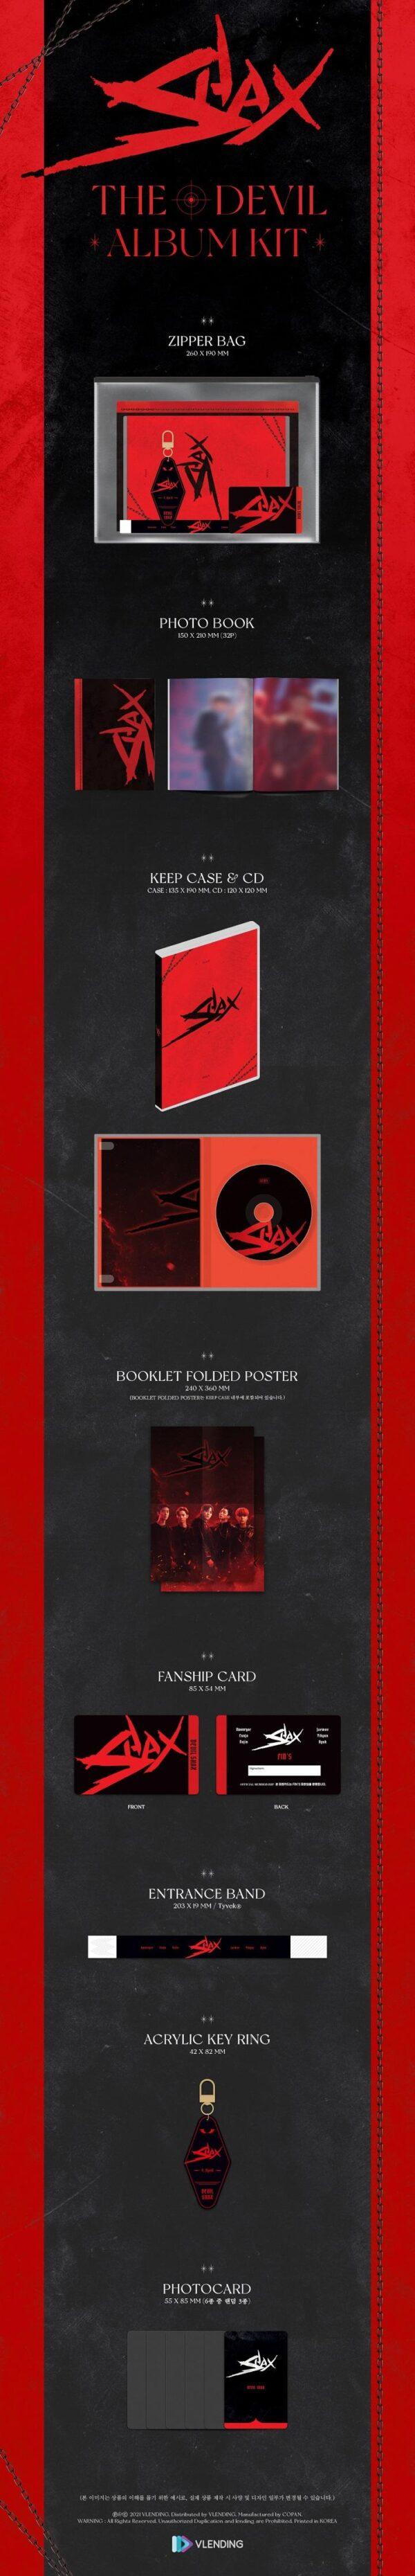 SHAX ALBUM THE DEVIL Drama Imitation OST 1